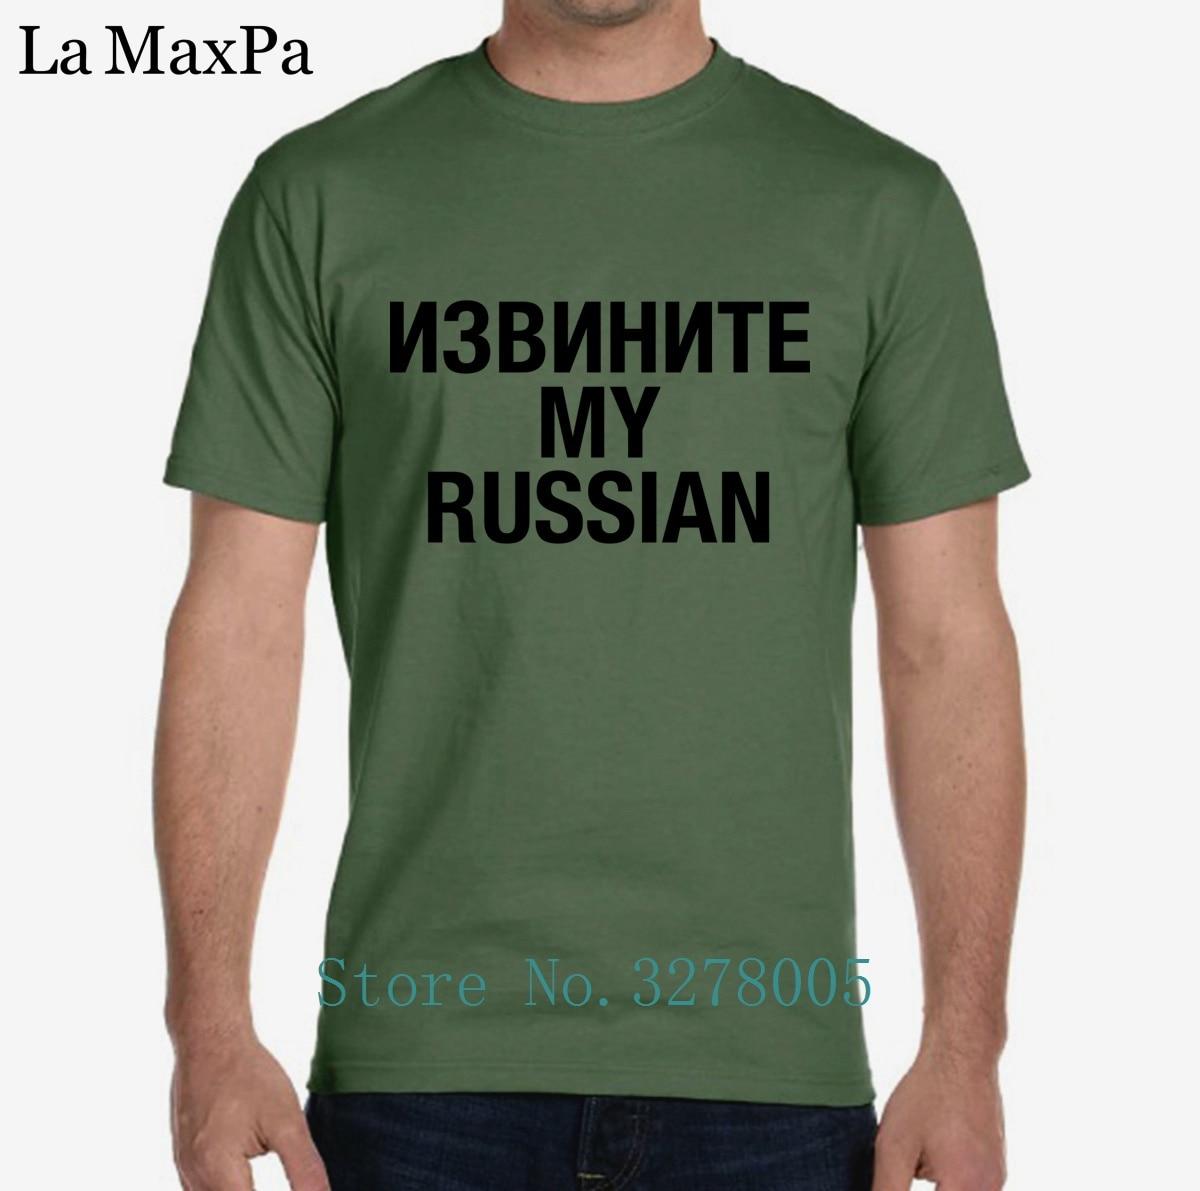 Personalizar camiseta divertida ocasional Rusia San Petersburgo hombres camiseta traje camiseta humor verano o-cuello Top pop camiseta